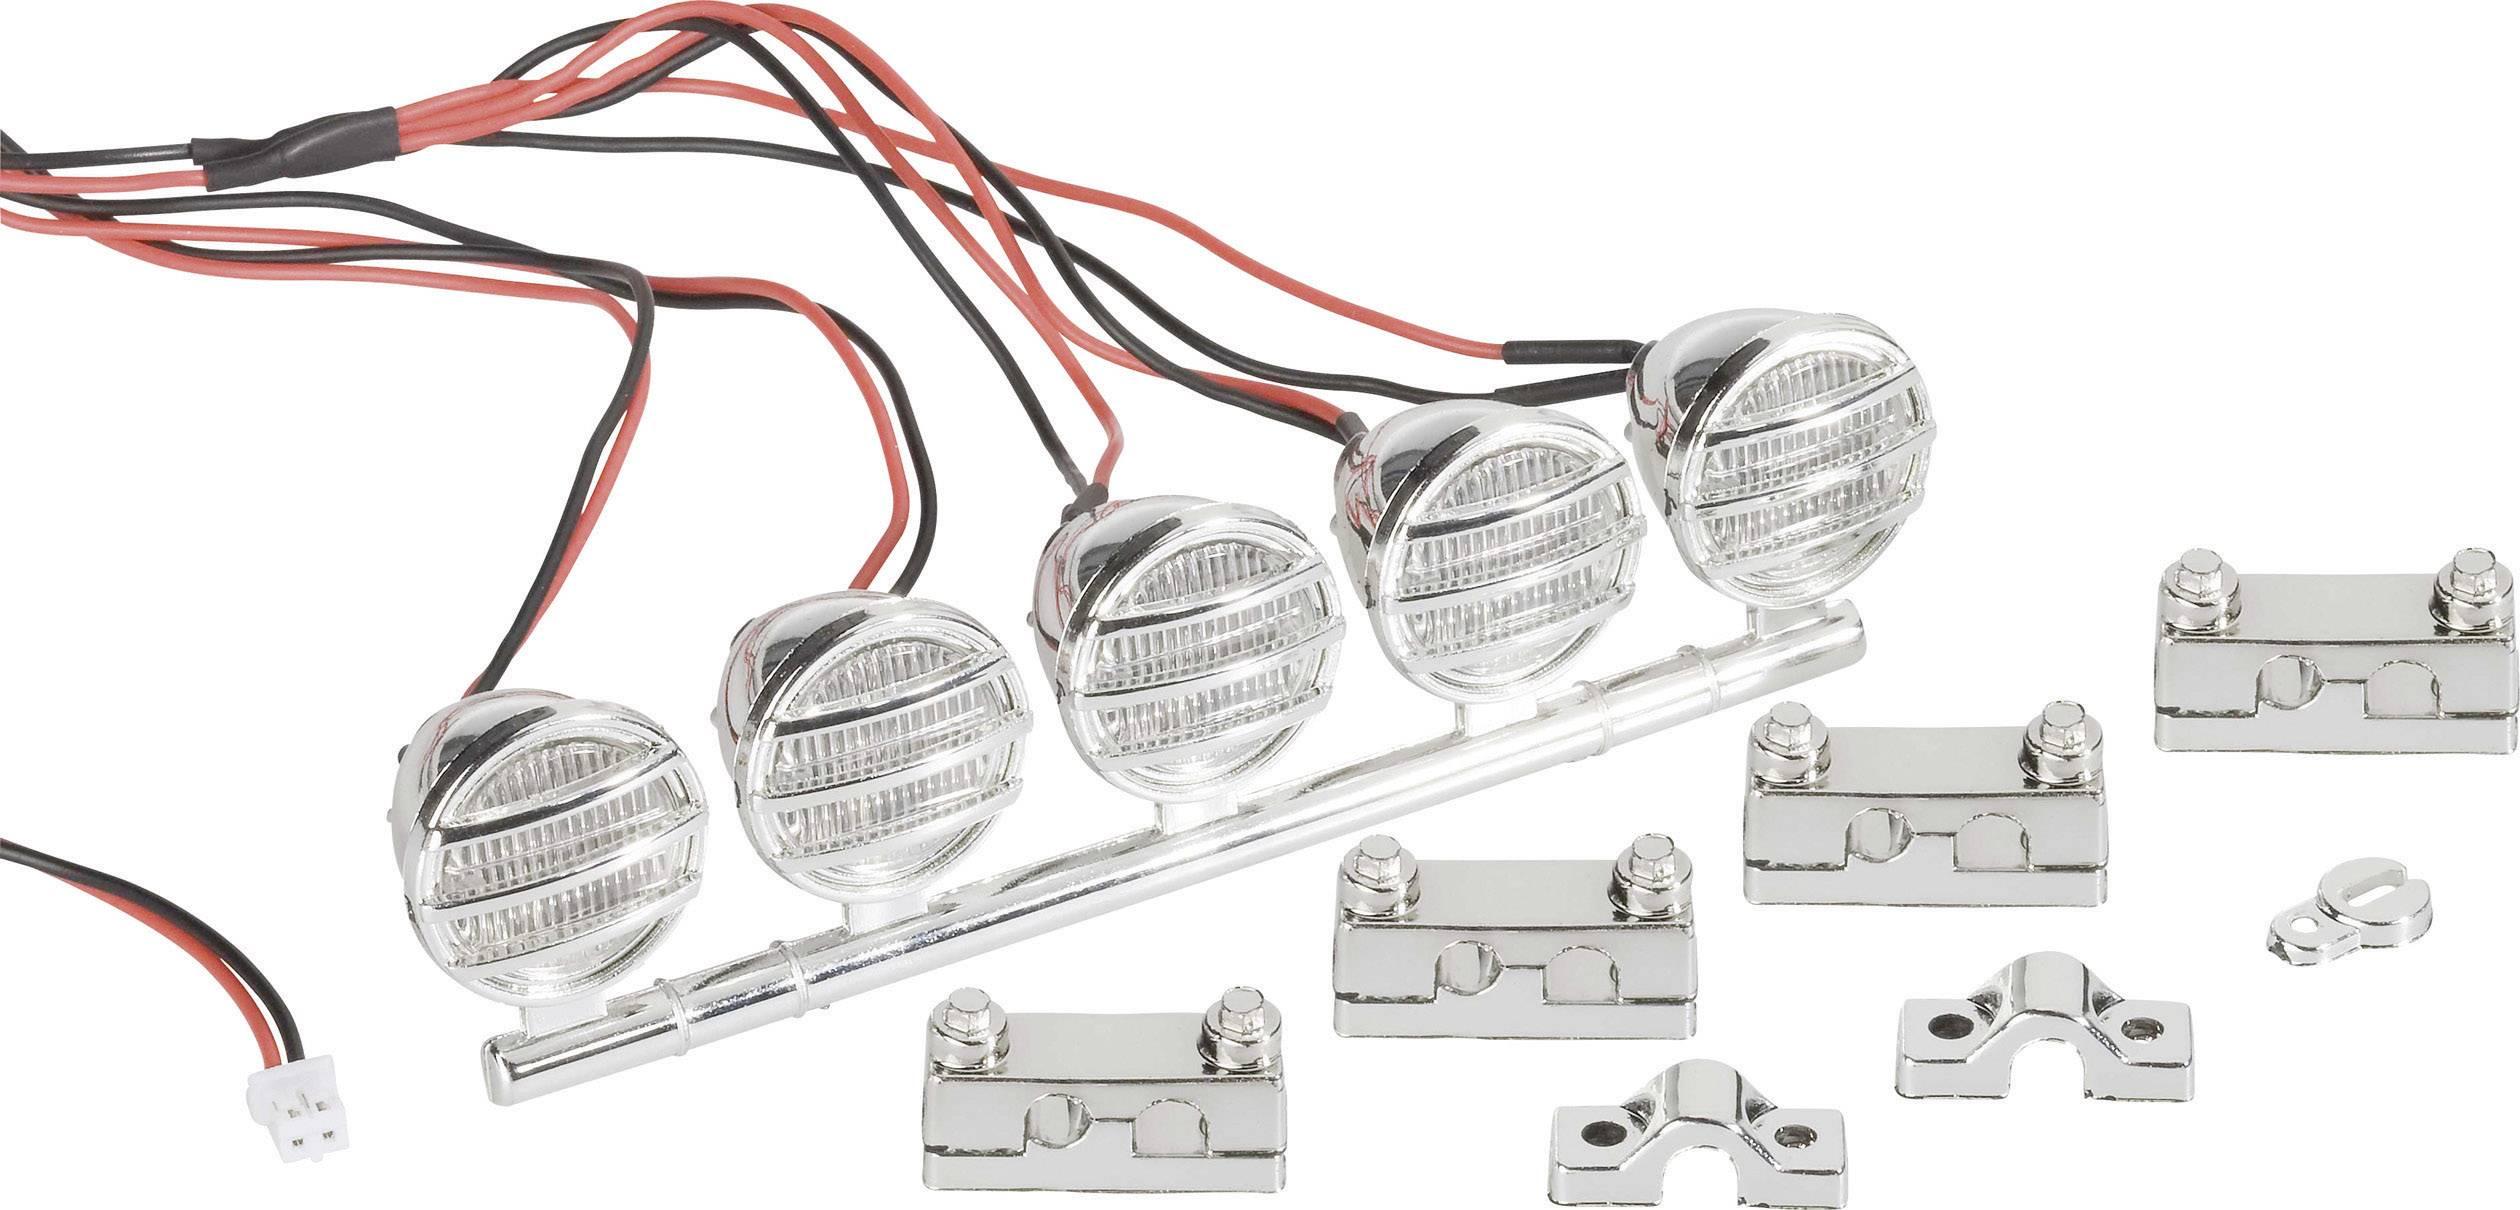 LED osvetlenie pre modely Crawler Modelcraft LEDK-5